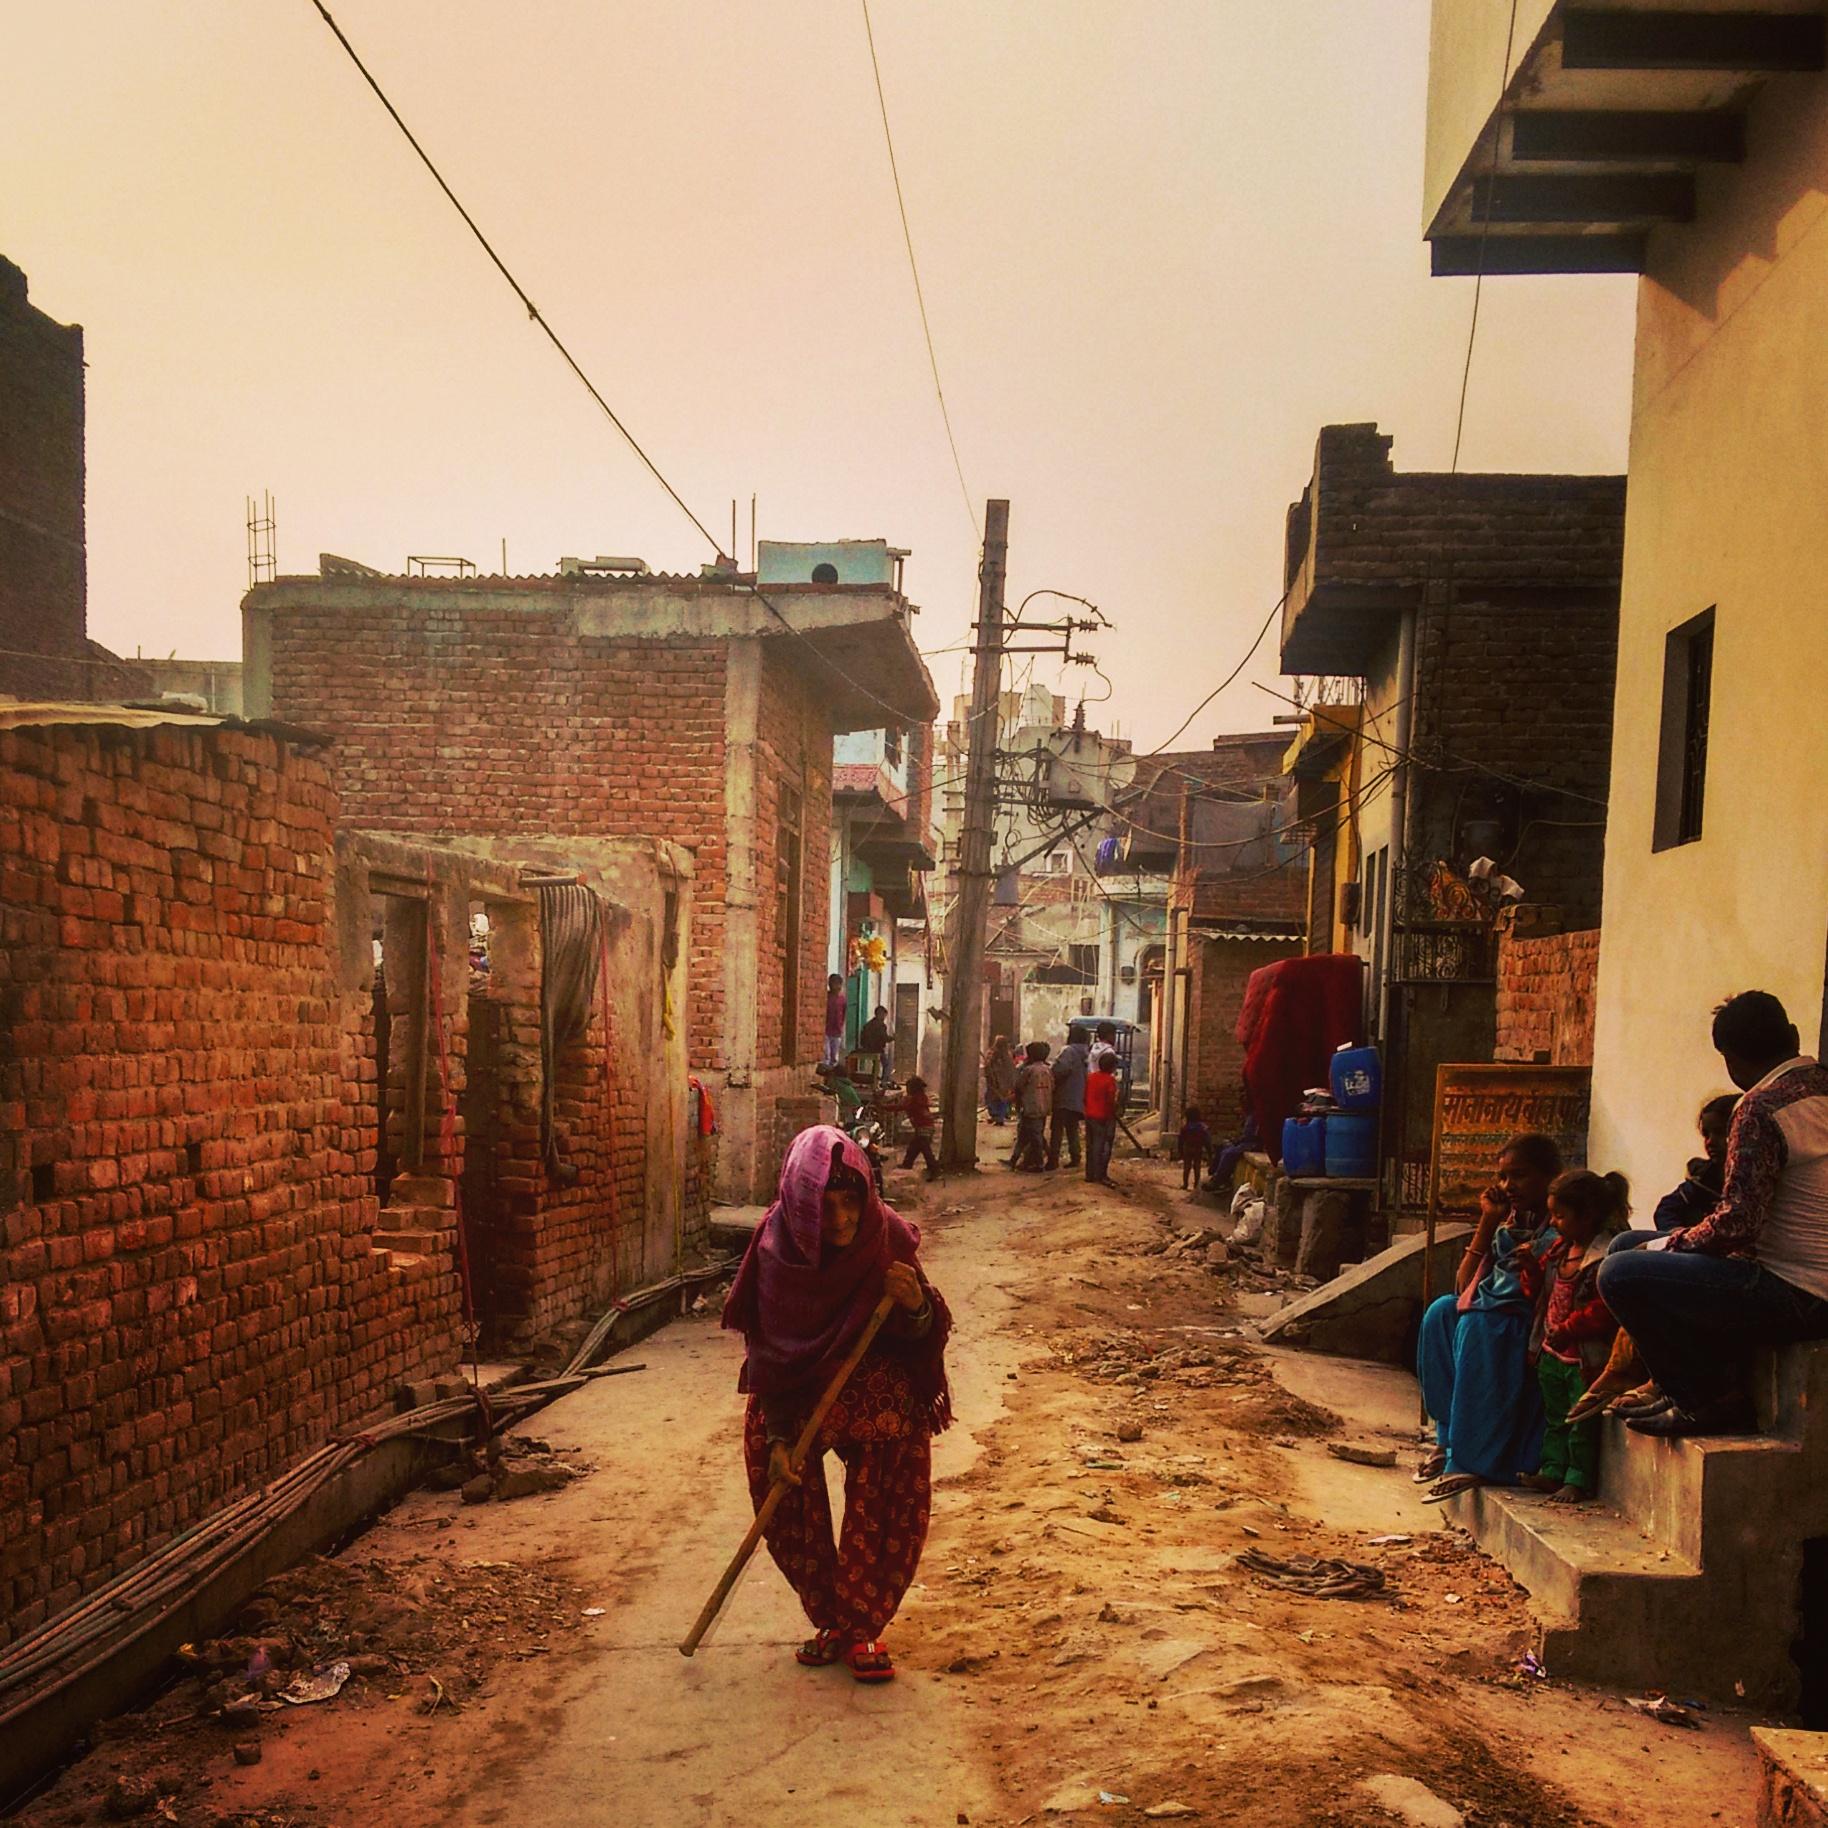 Perna Women In India: How Their Caste Supports Sex Work   Youth Ki Awaaz